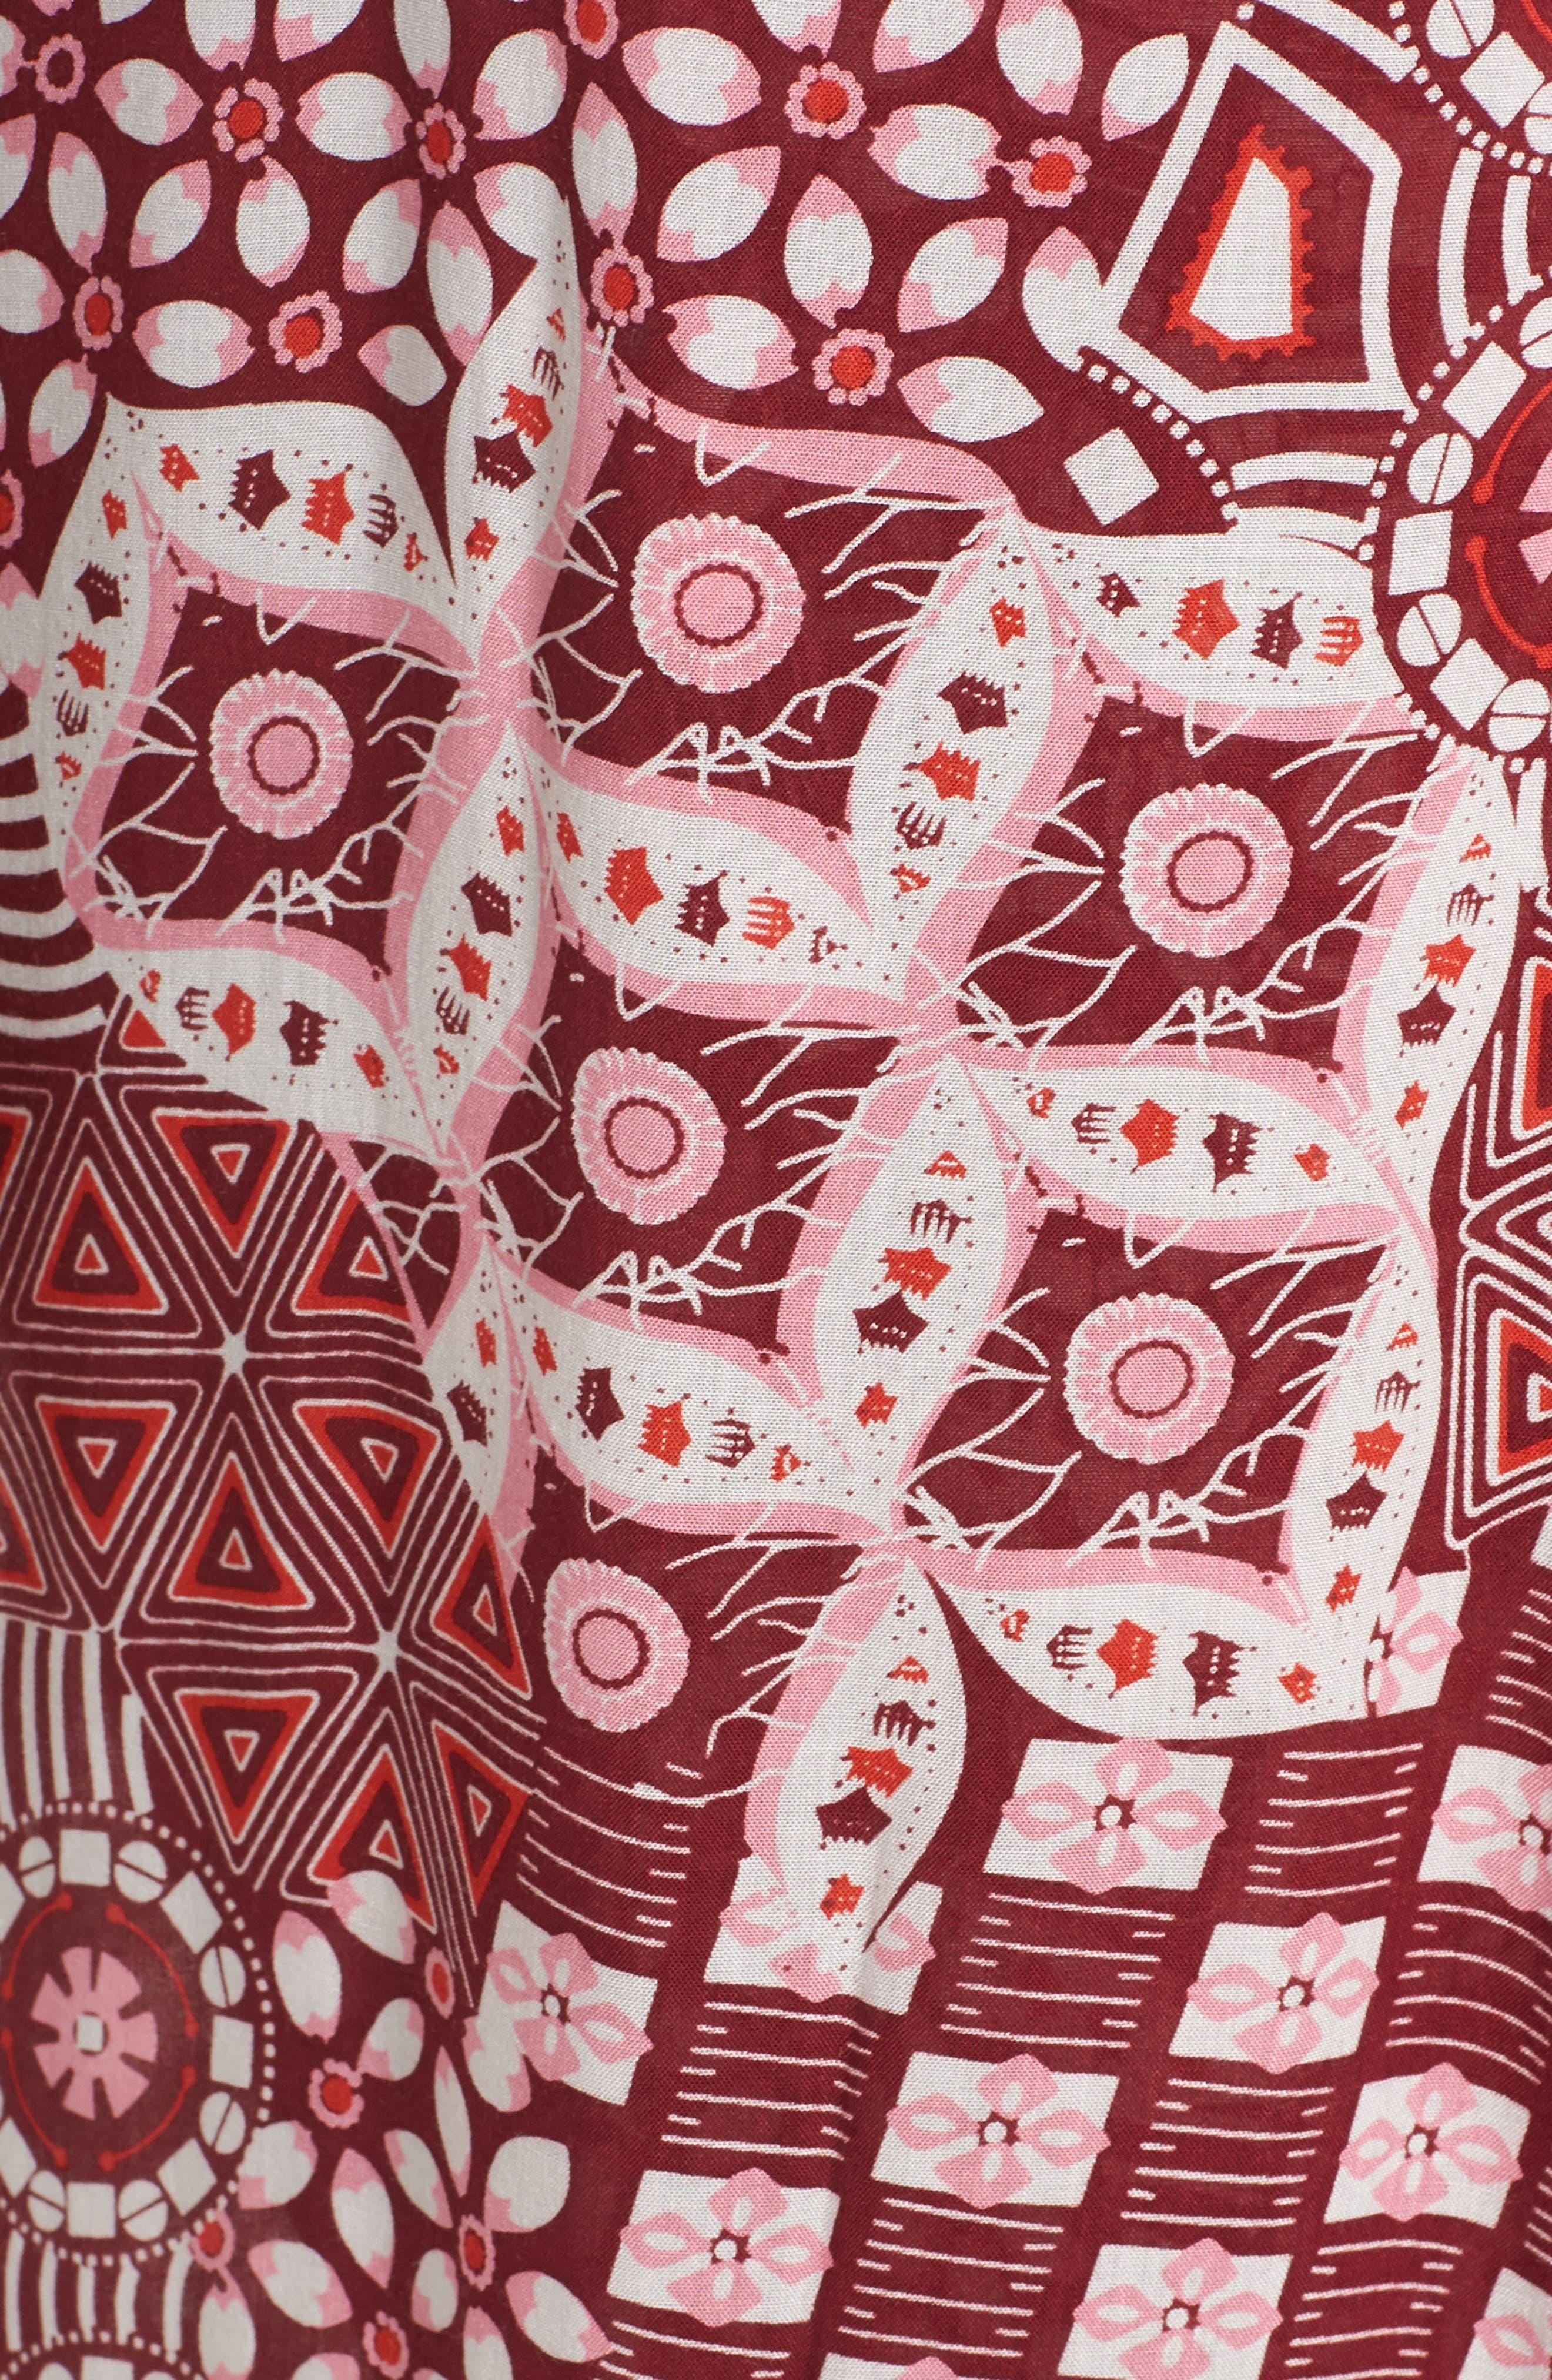 Poupette St. Barth Joe Cover-Up Maxi Dress,                             Alternate thumbnail 5, color,                             650